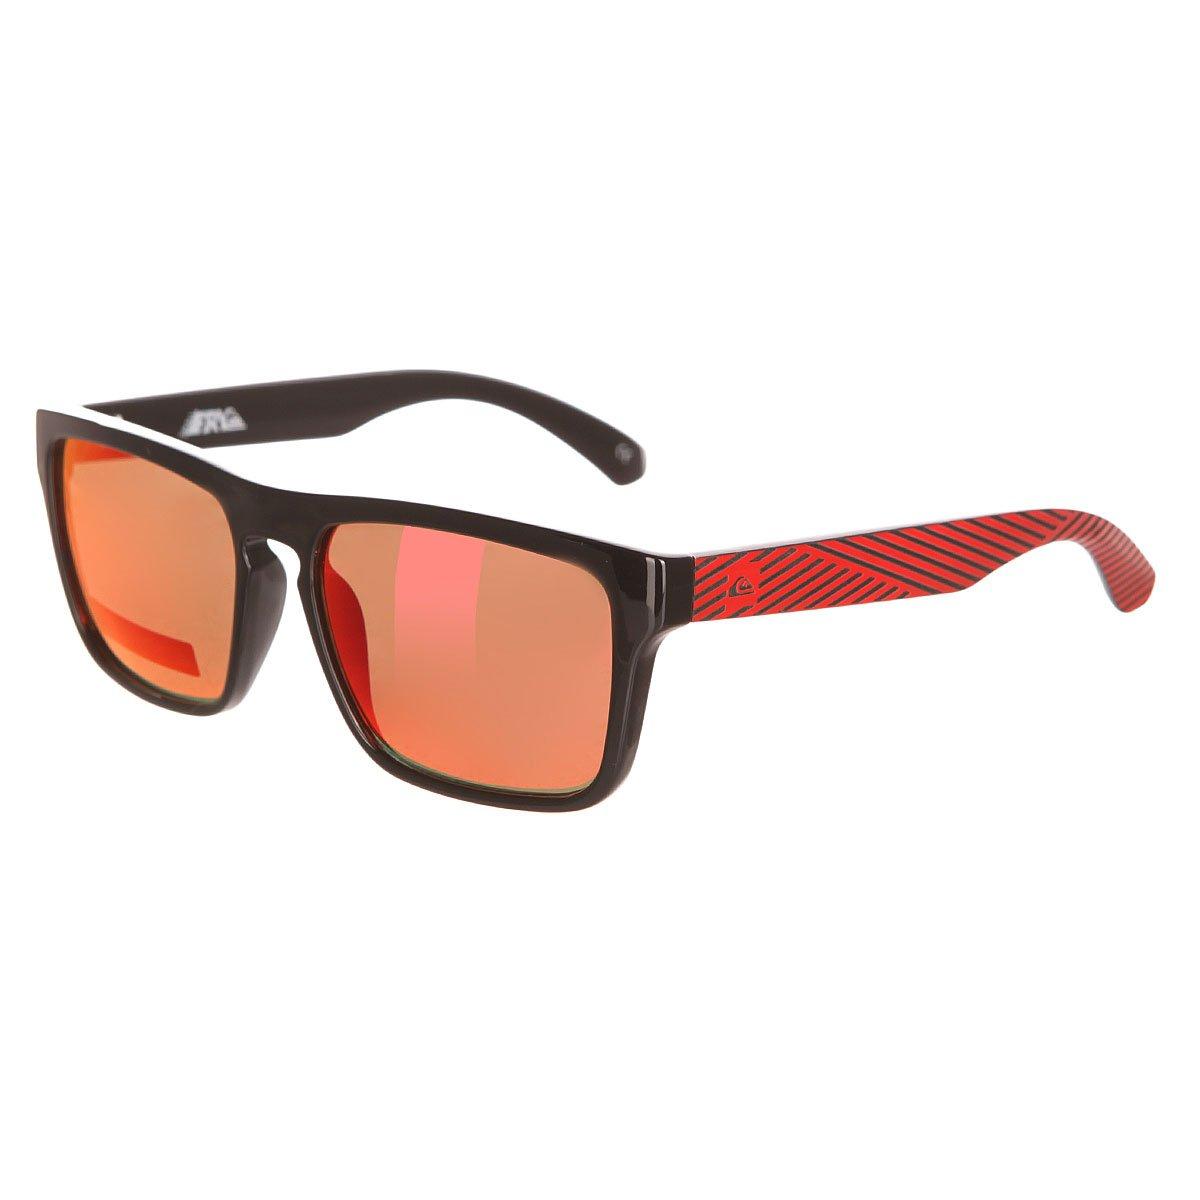 0b2708f0cac9 Купить очки детские Quiksilver Small Fry Black Red Ml Red (EKS4077 ...